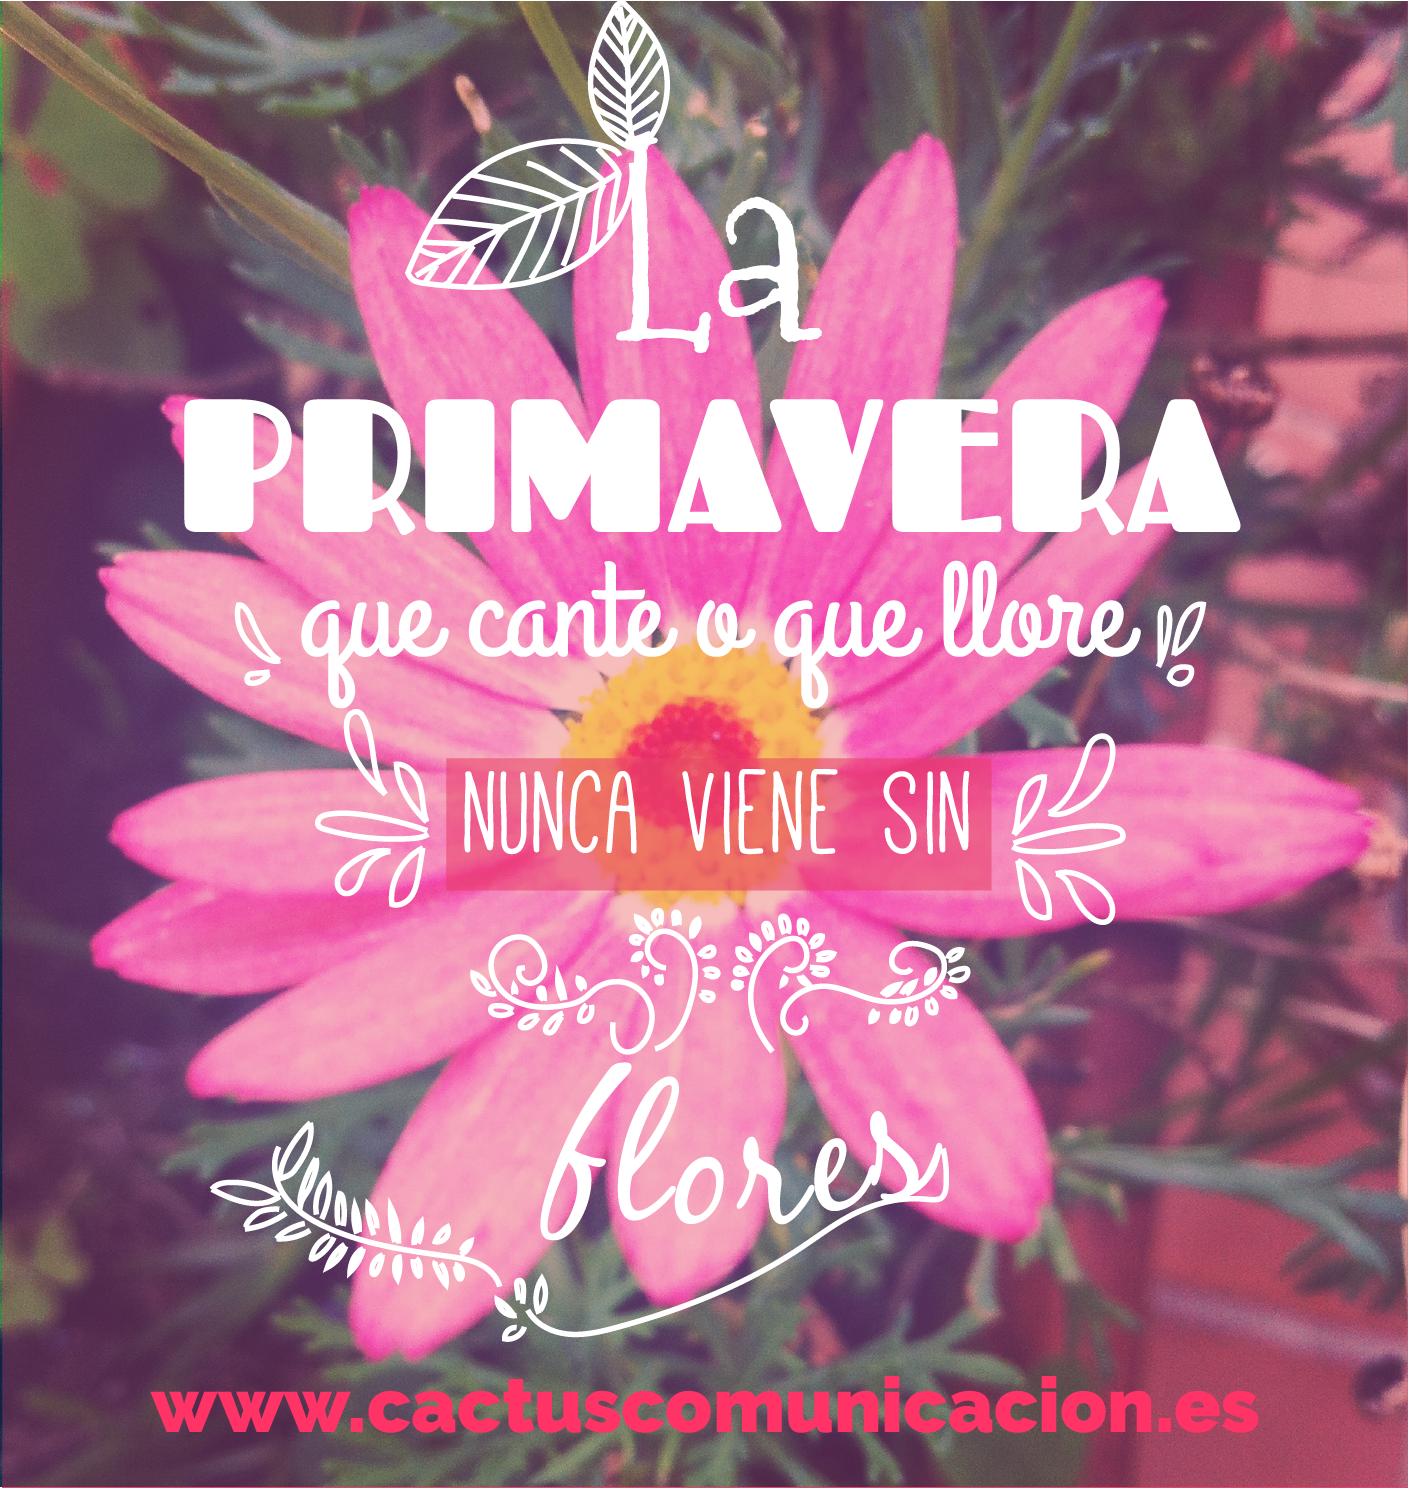 Bienvenida #primavera! #calendario #cactusdar | Imagenes de feliz primavera,  Feliz primavera, Frases de primavera